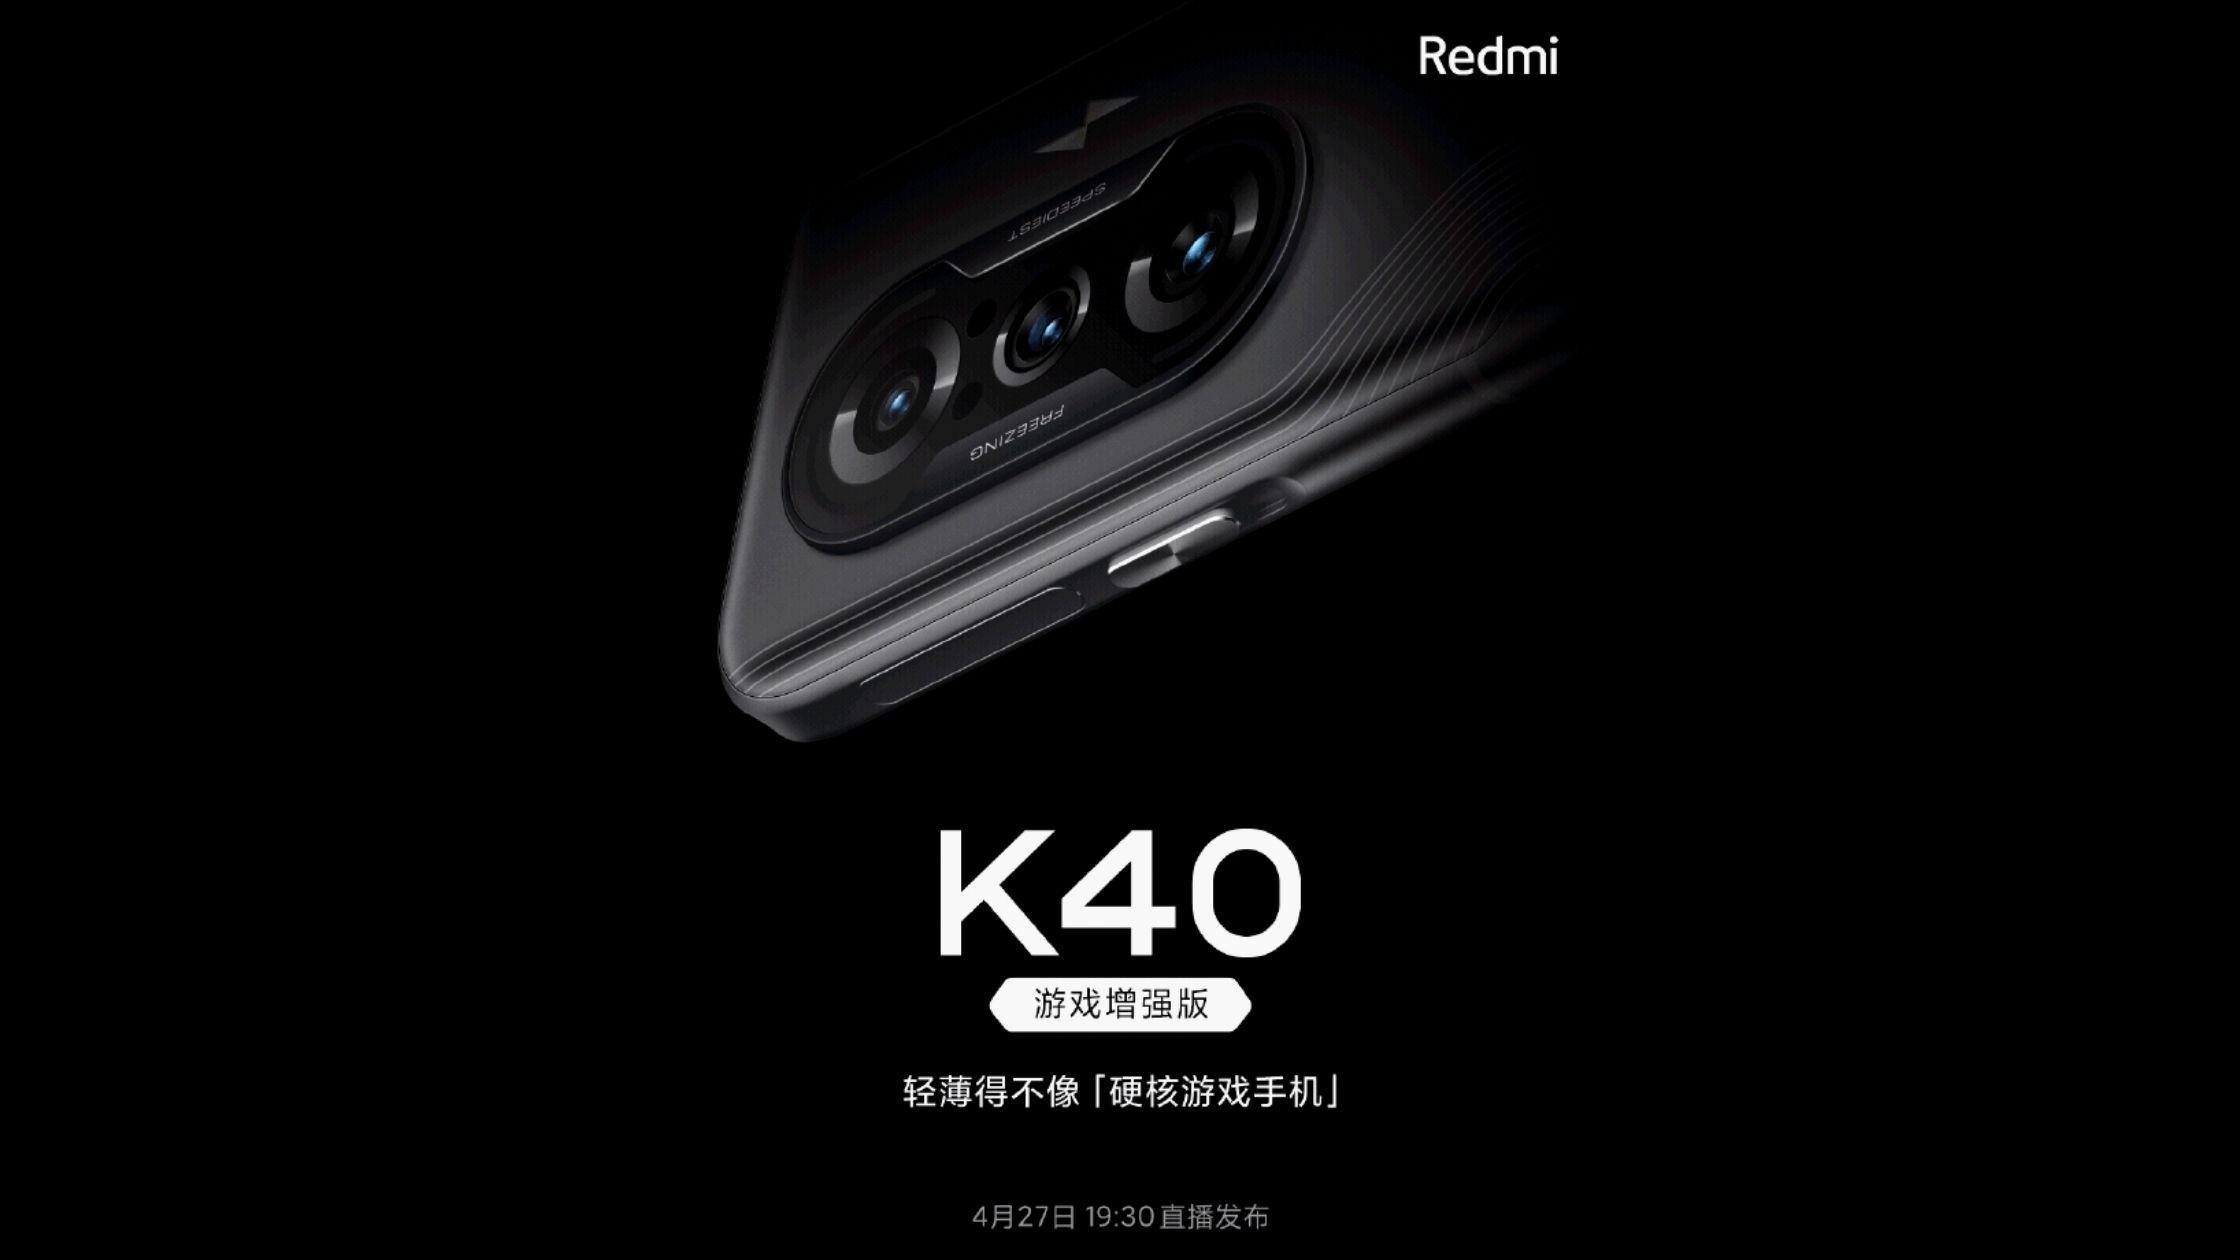 Redmi K40 gaming phone